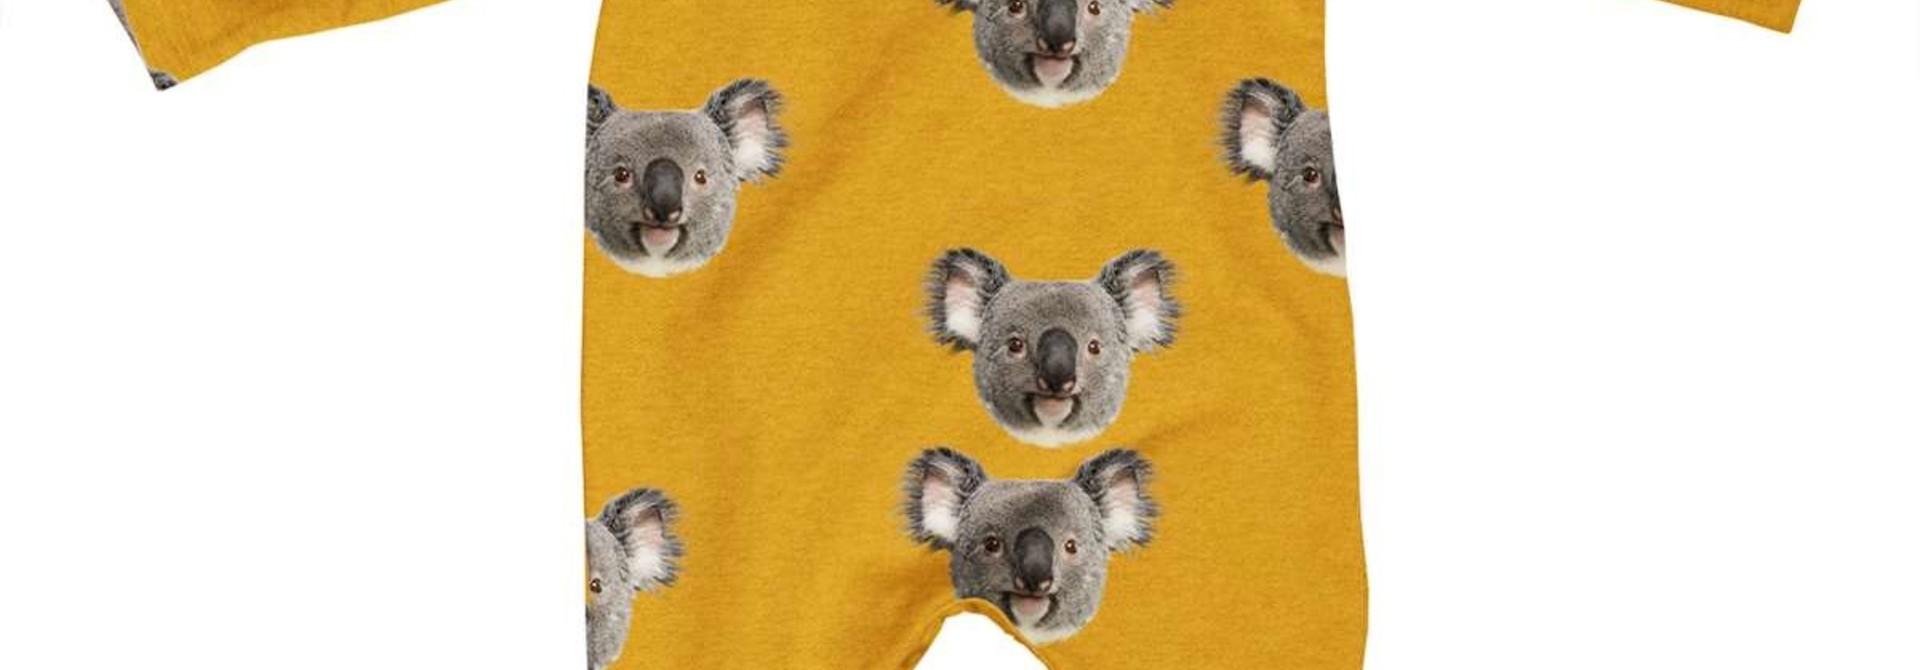 Jumpsuit - Koala - Sz 6/9 mo.